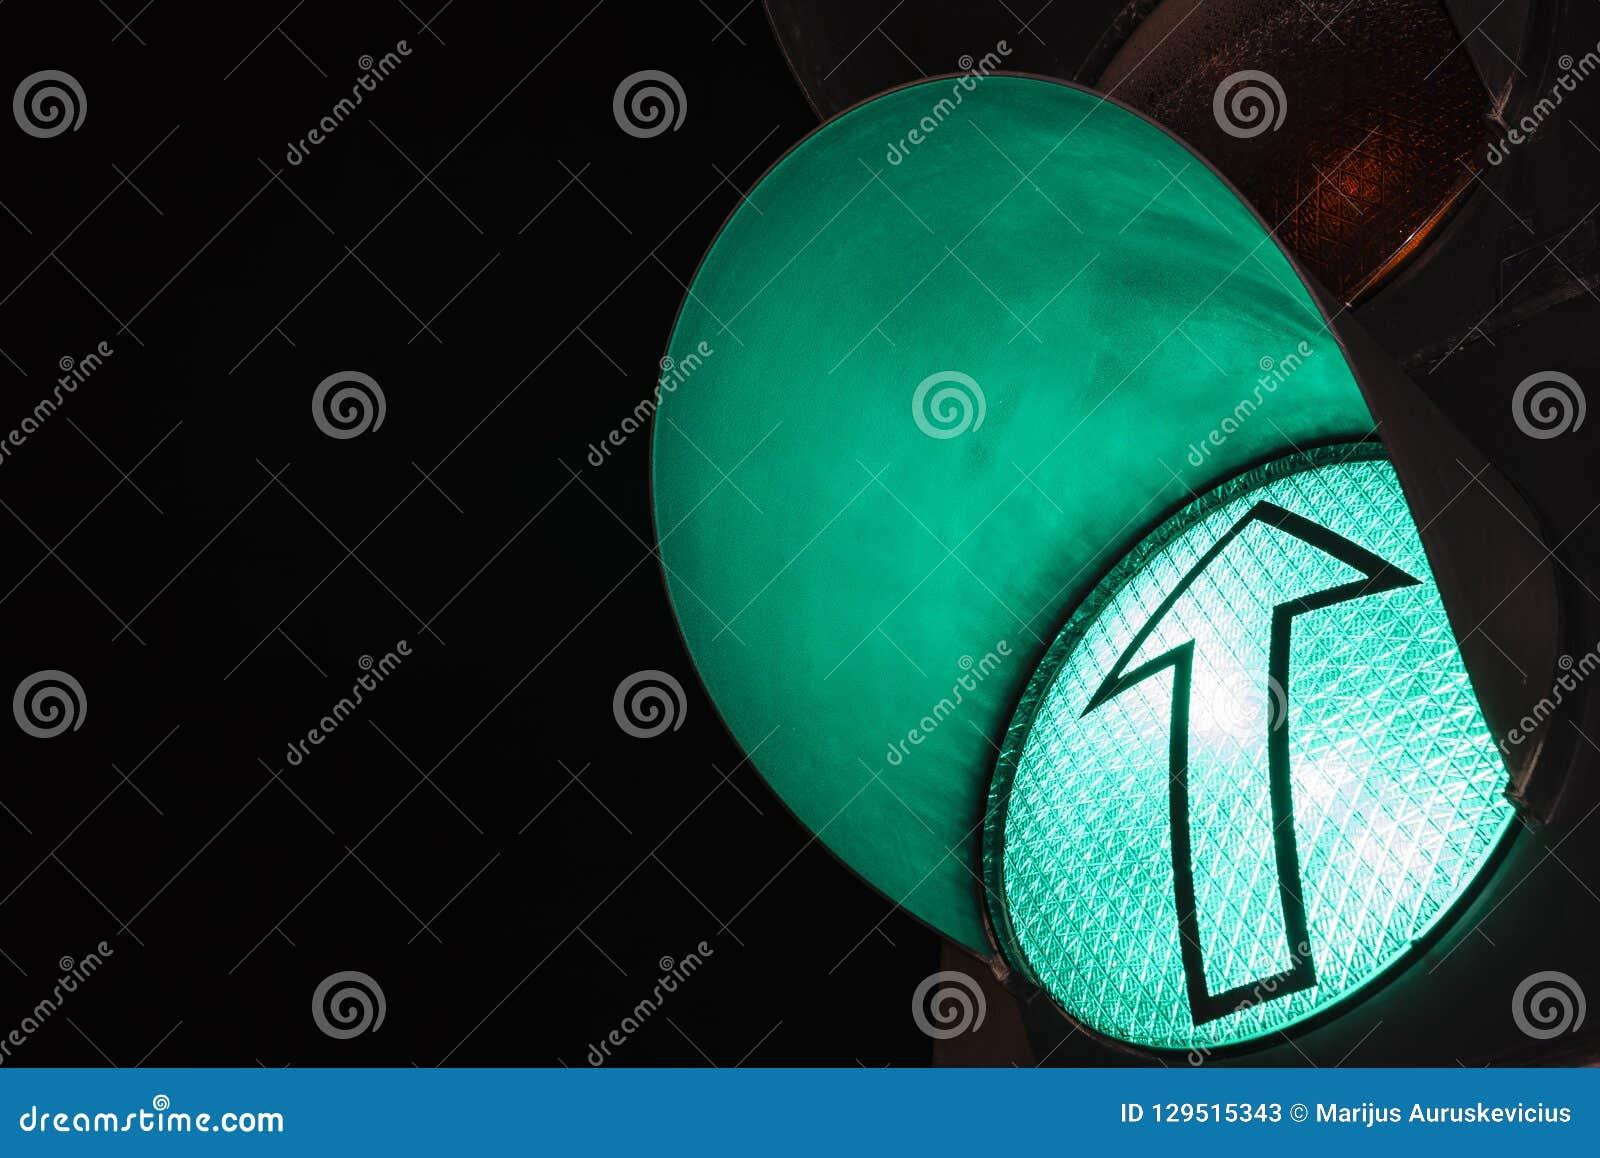 Traffic lights – green